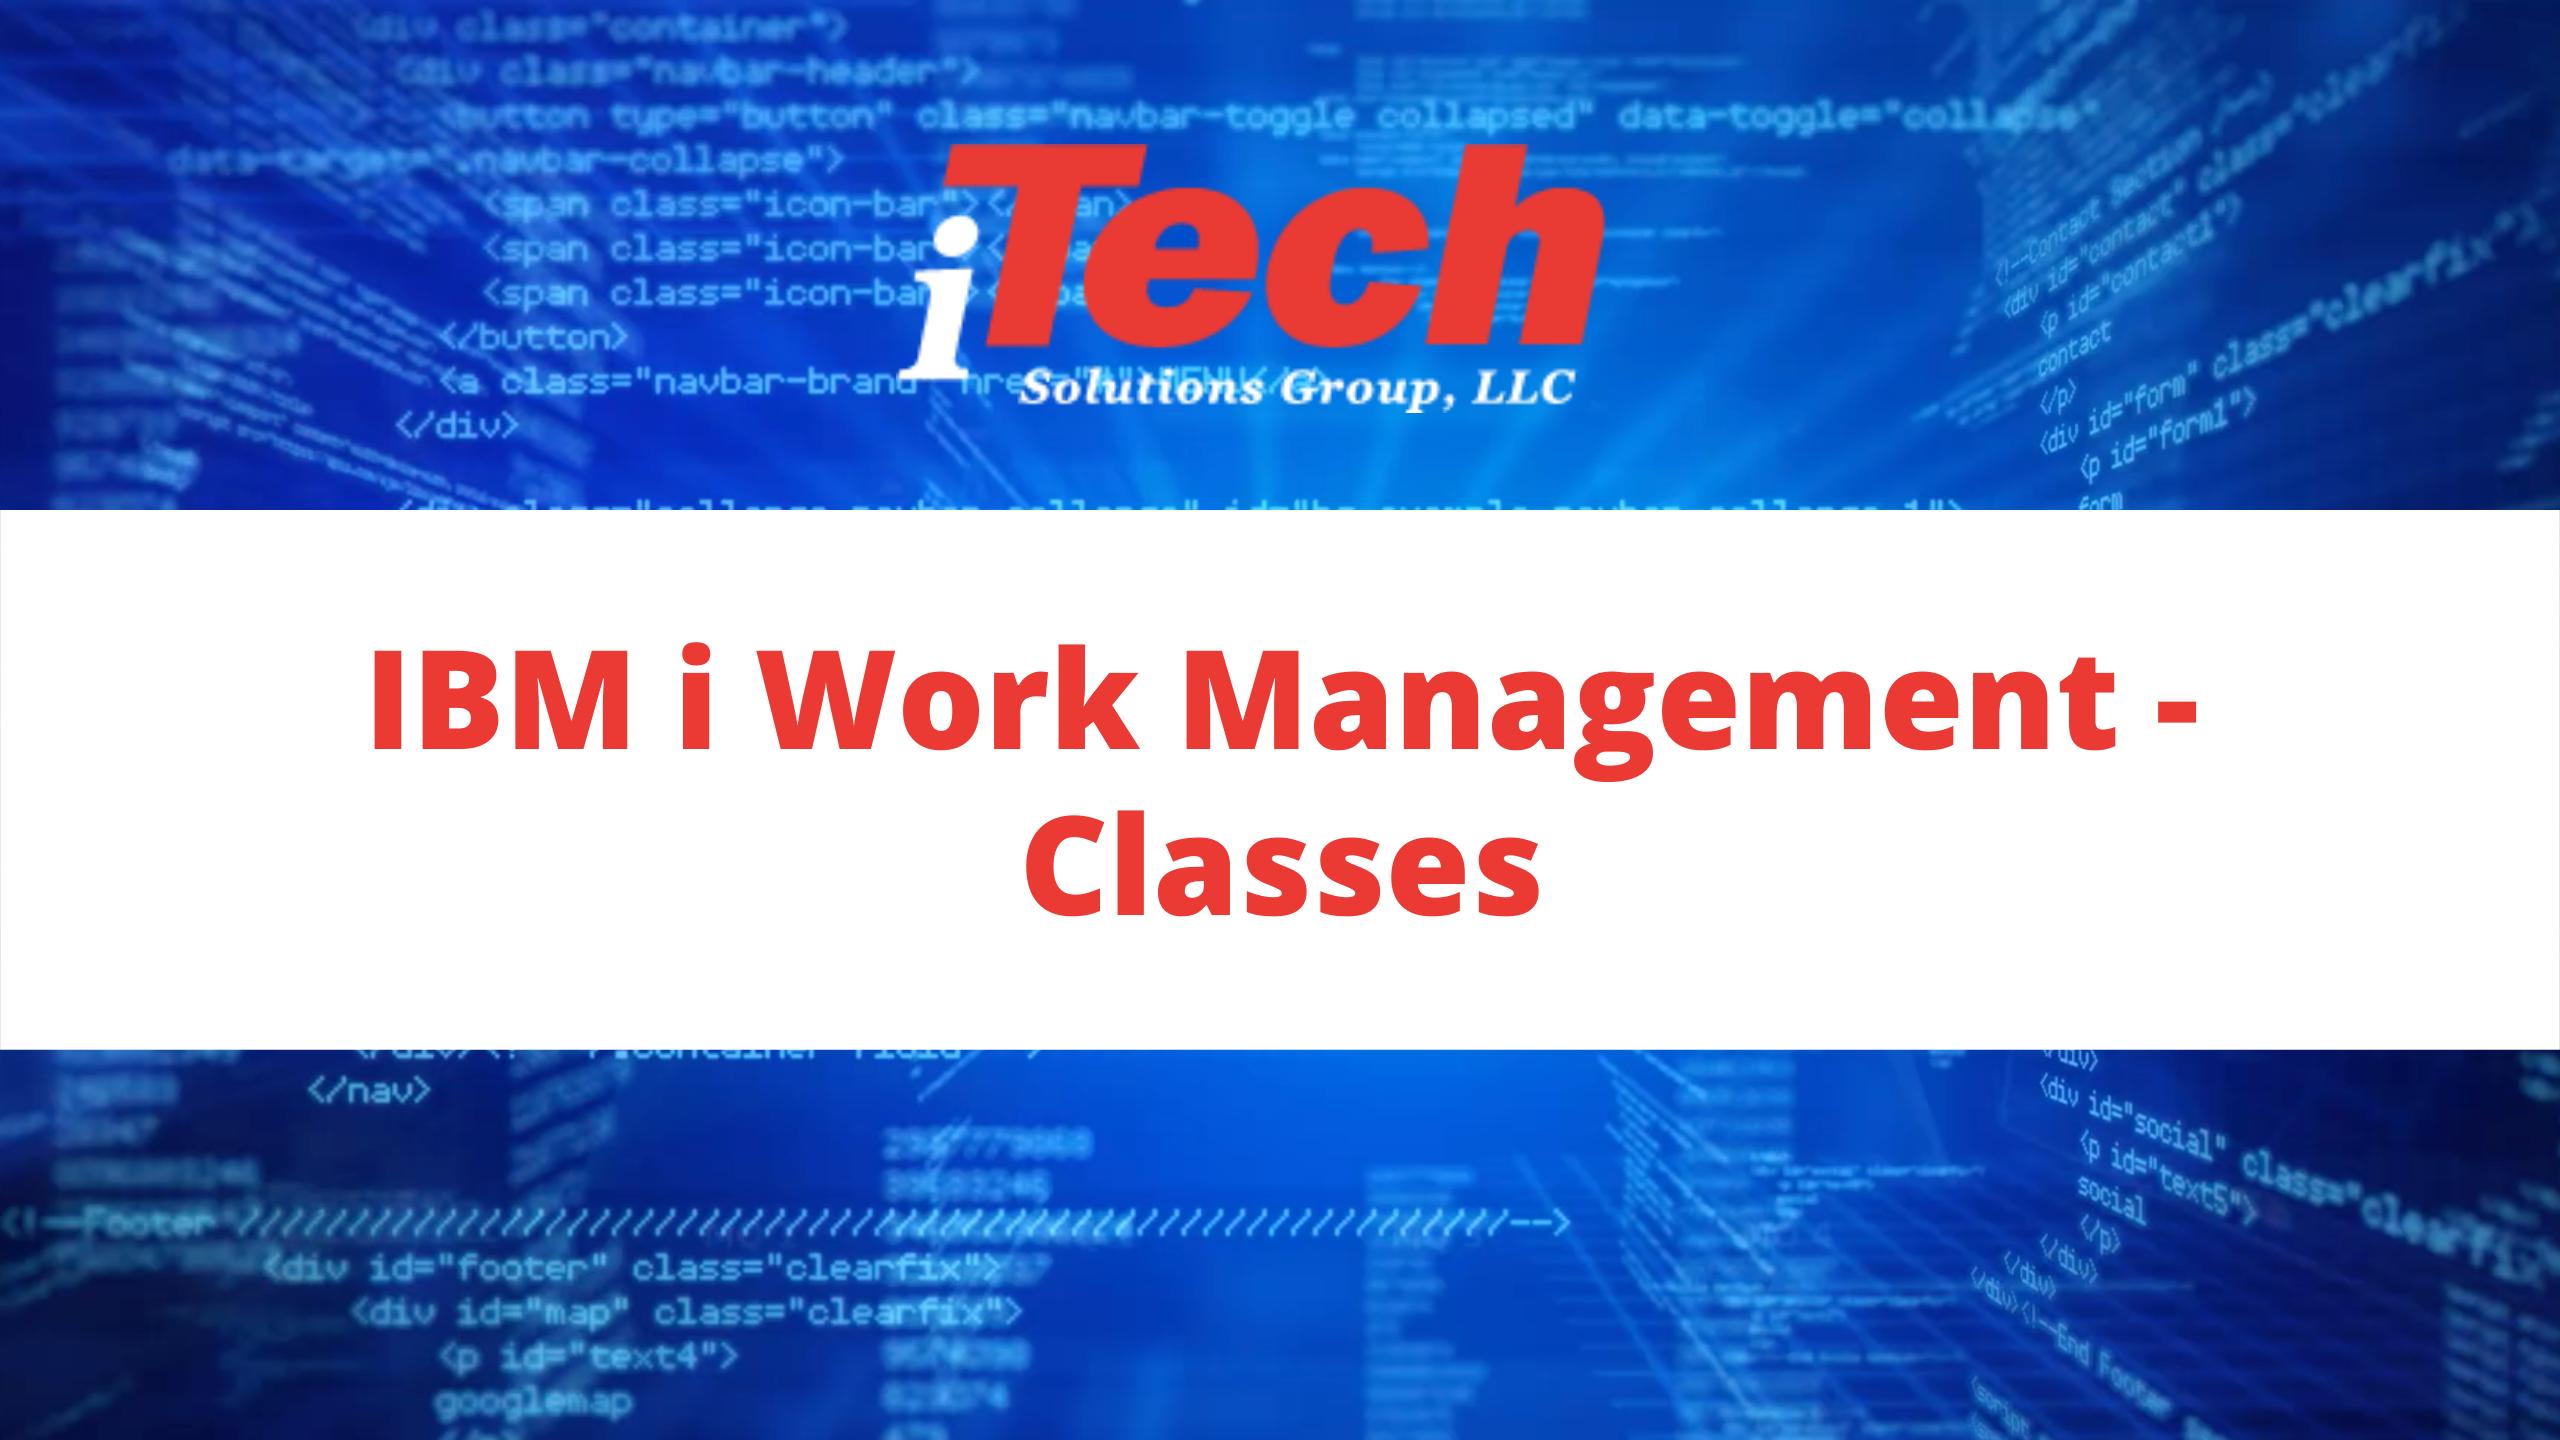 IBM i Work Management - Classes (1)